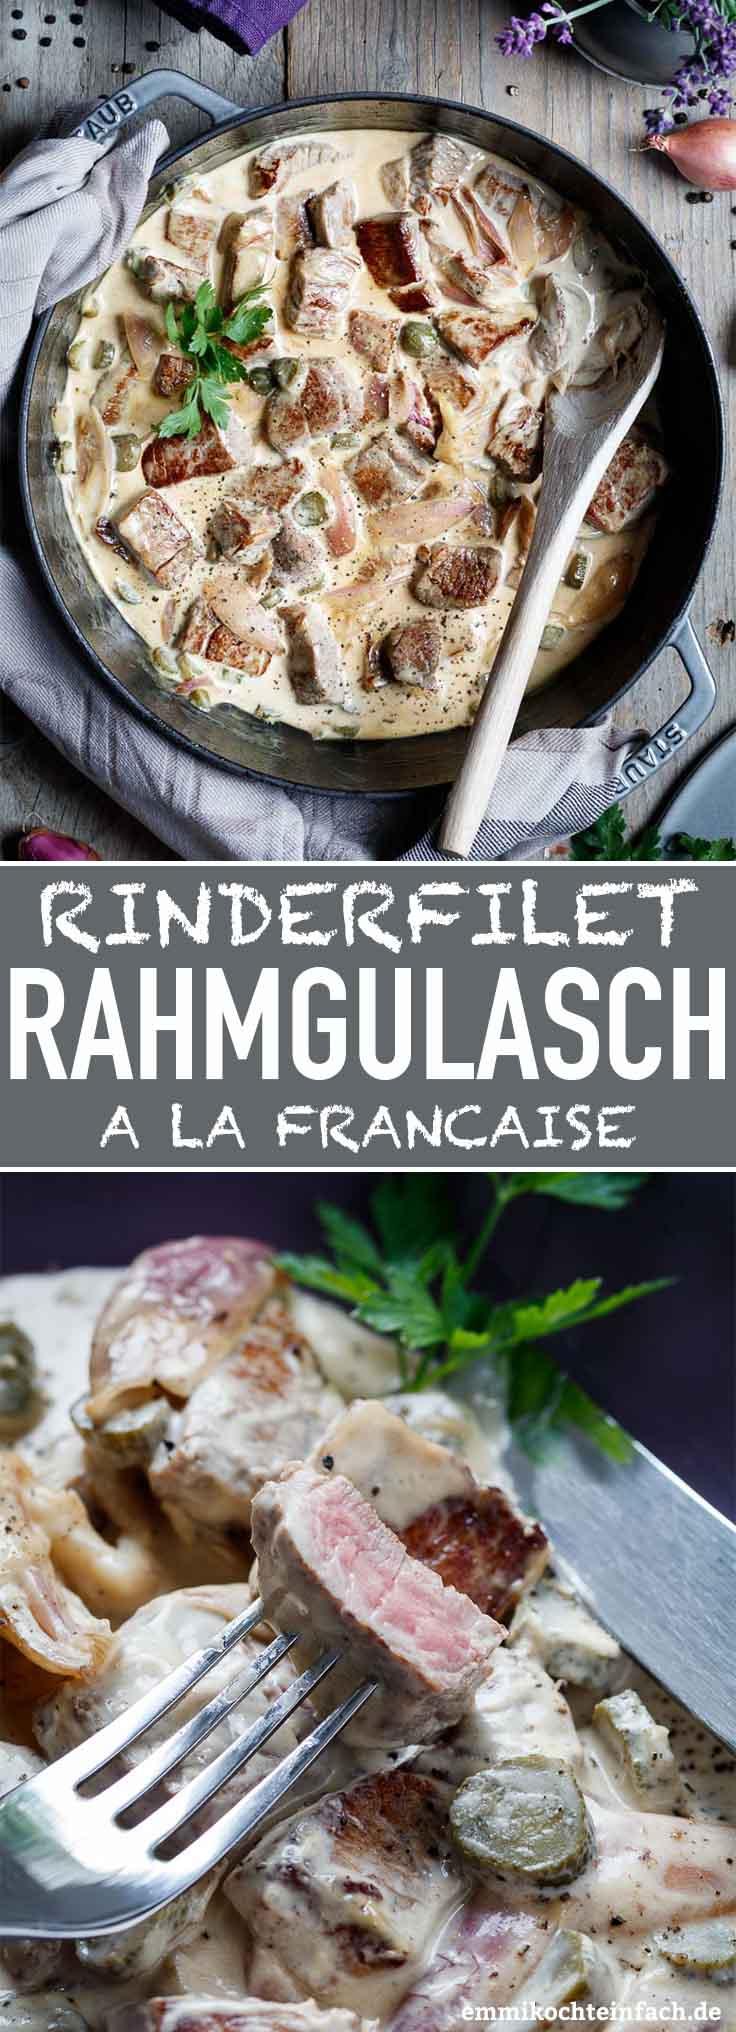 Rinderfilet Rahmgulasch a la francaise - www.emmikochteinfach.de